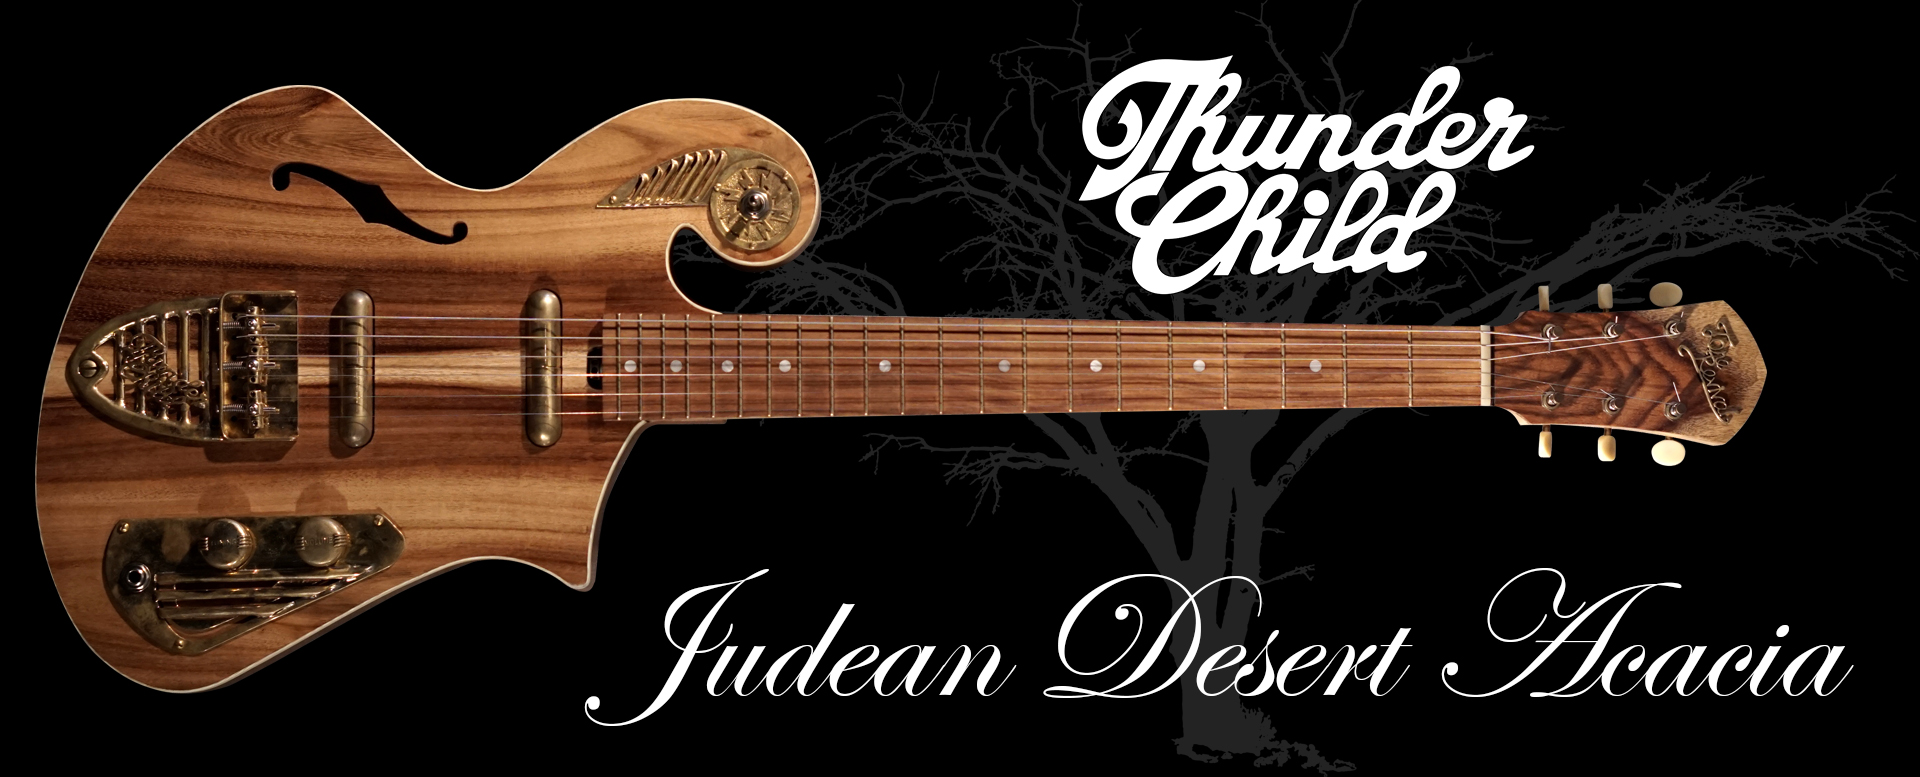 Judean Desert Acacia - Thunder Child boutique guitar